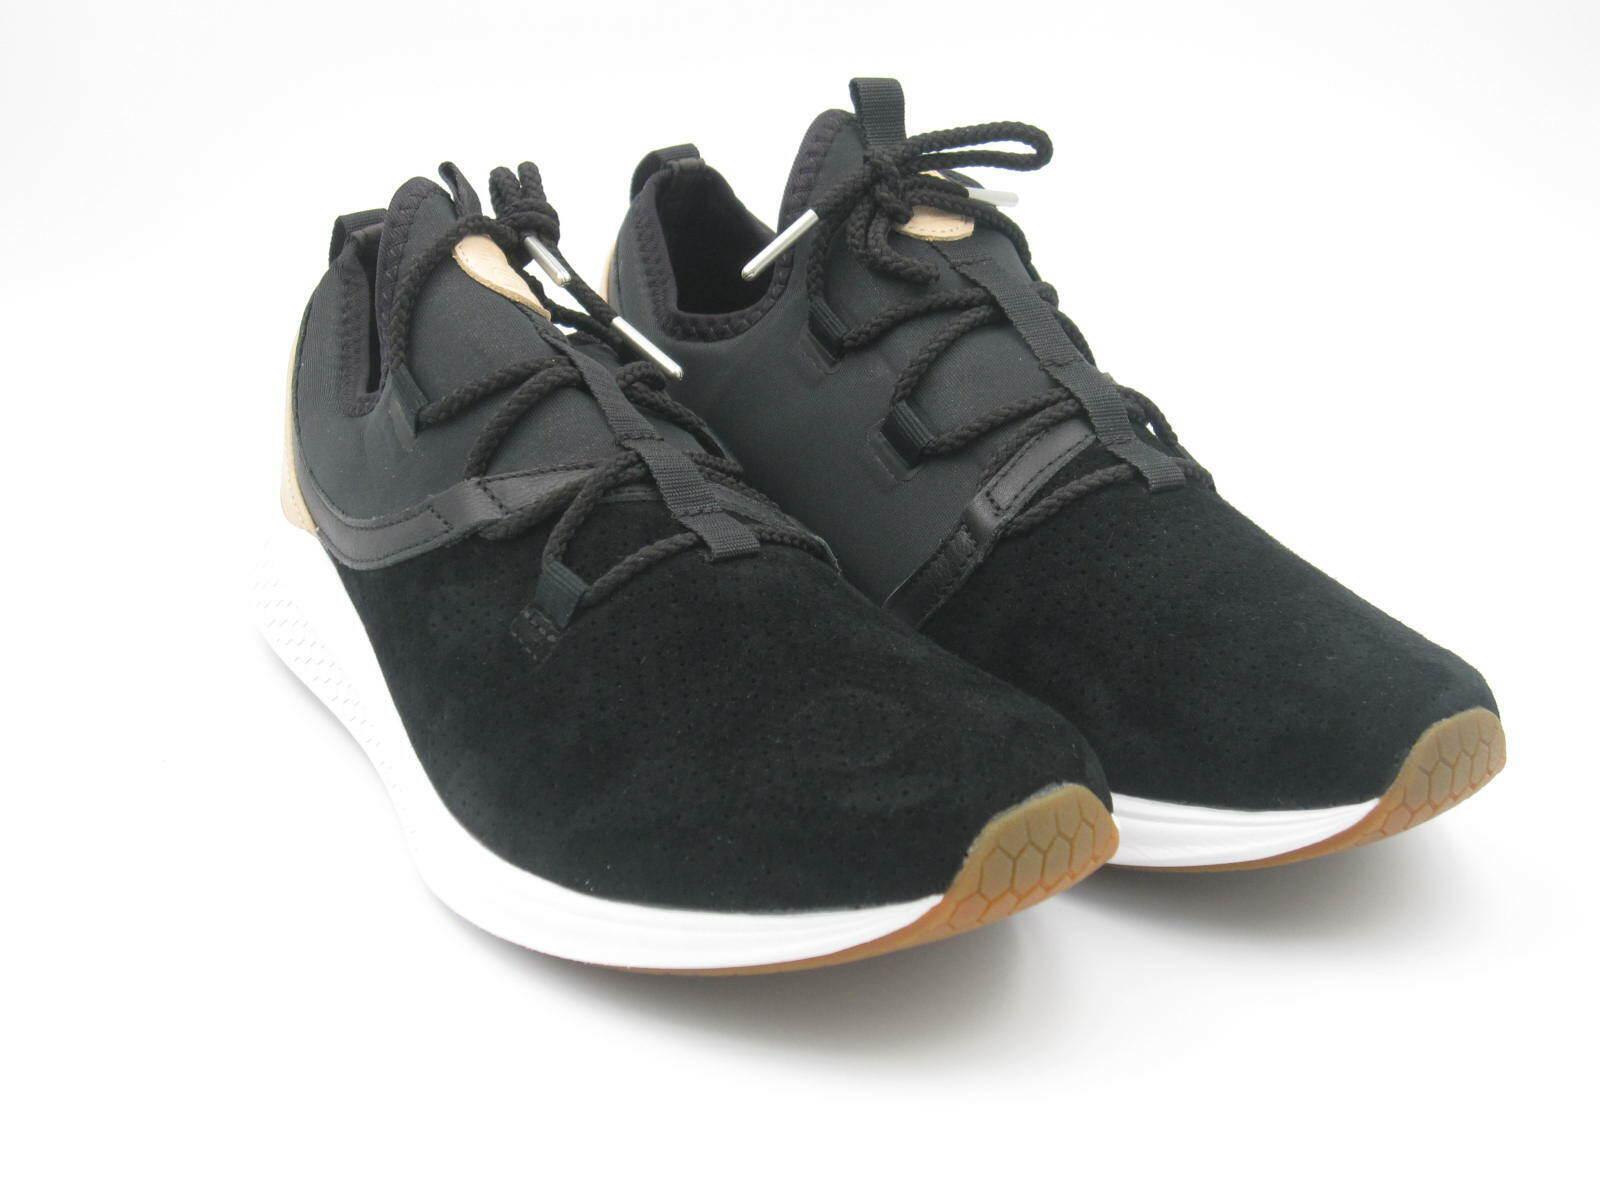 New New Balance Fresh Foam Lazr Heathered shoes Size 11 US (ULAZRLB) A18